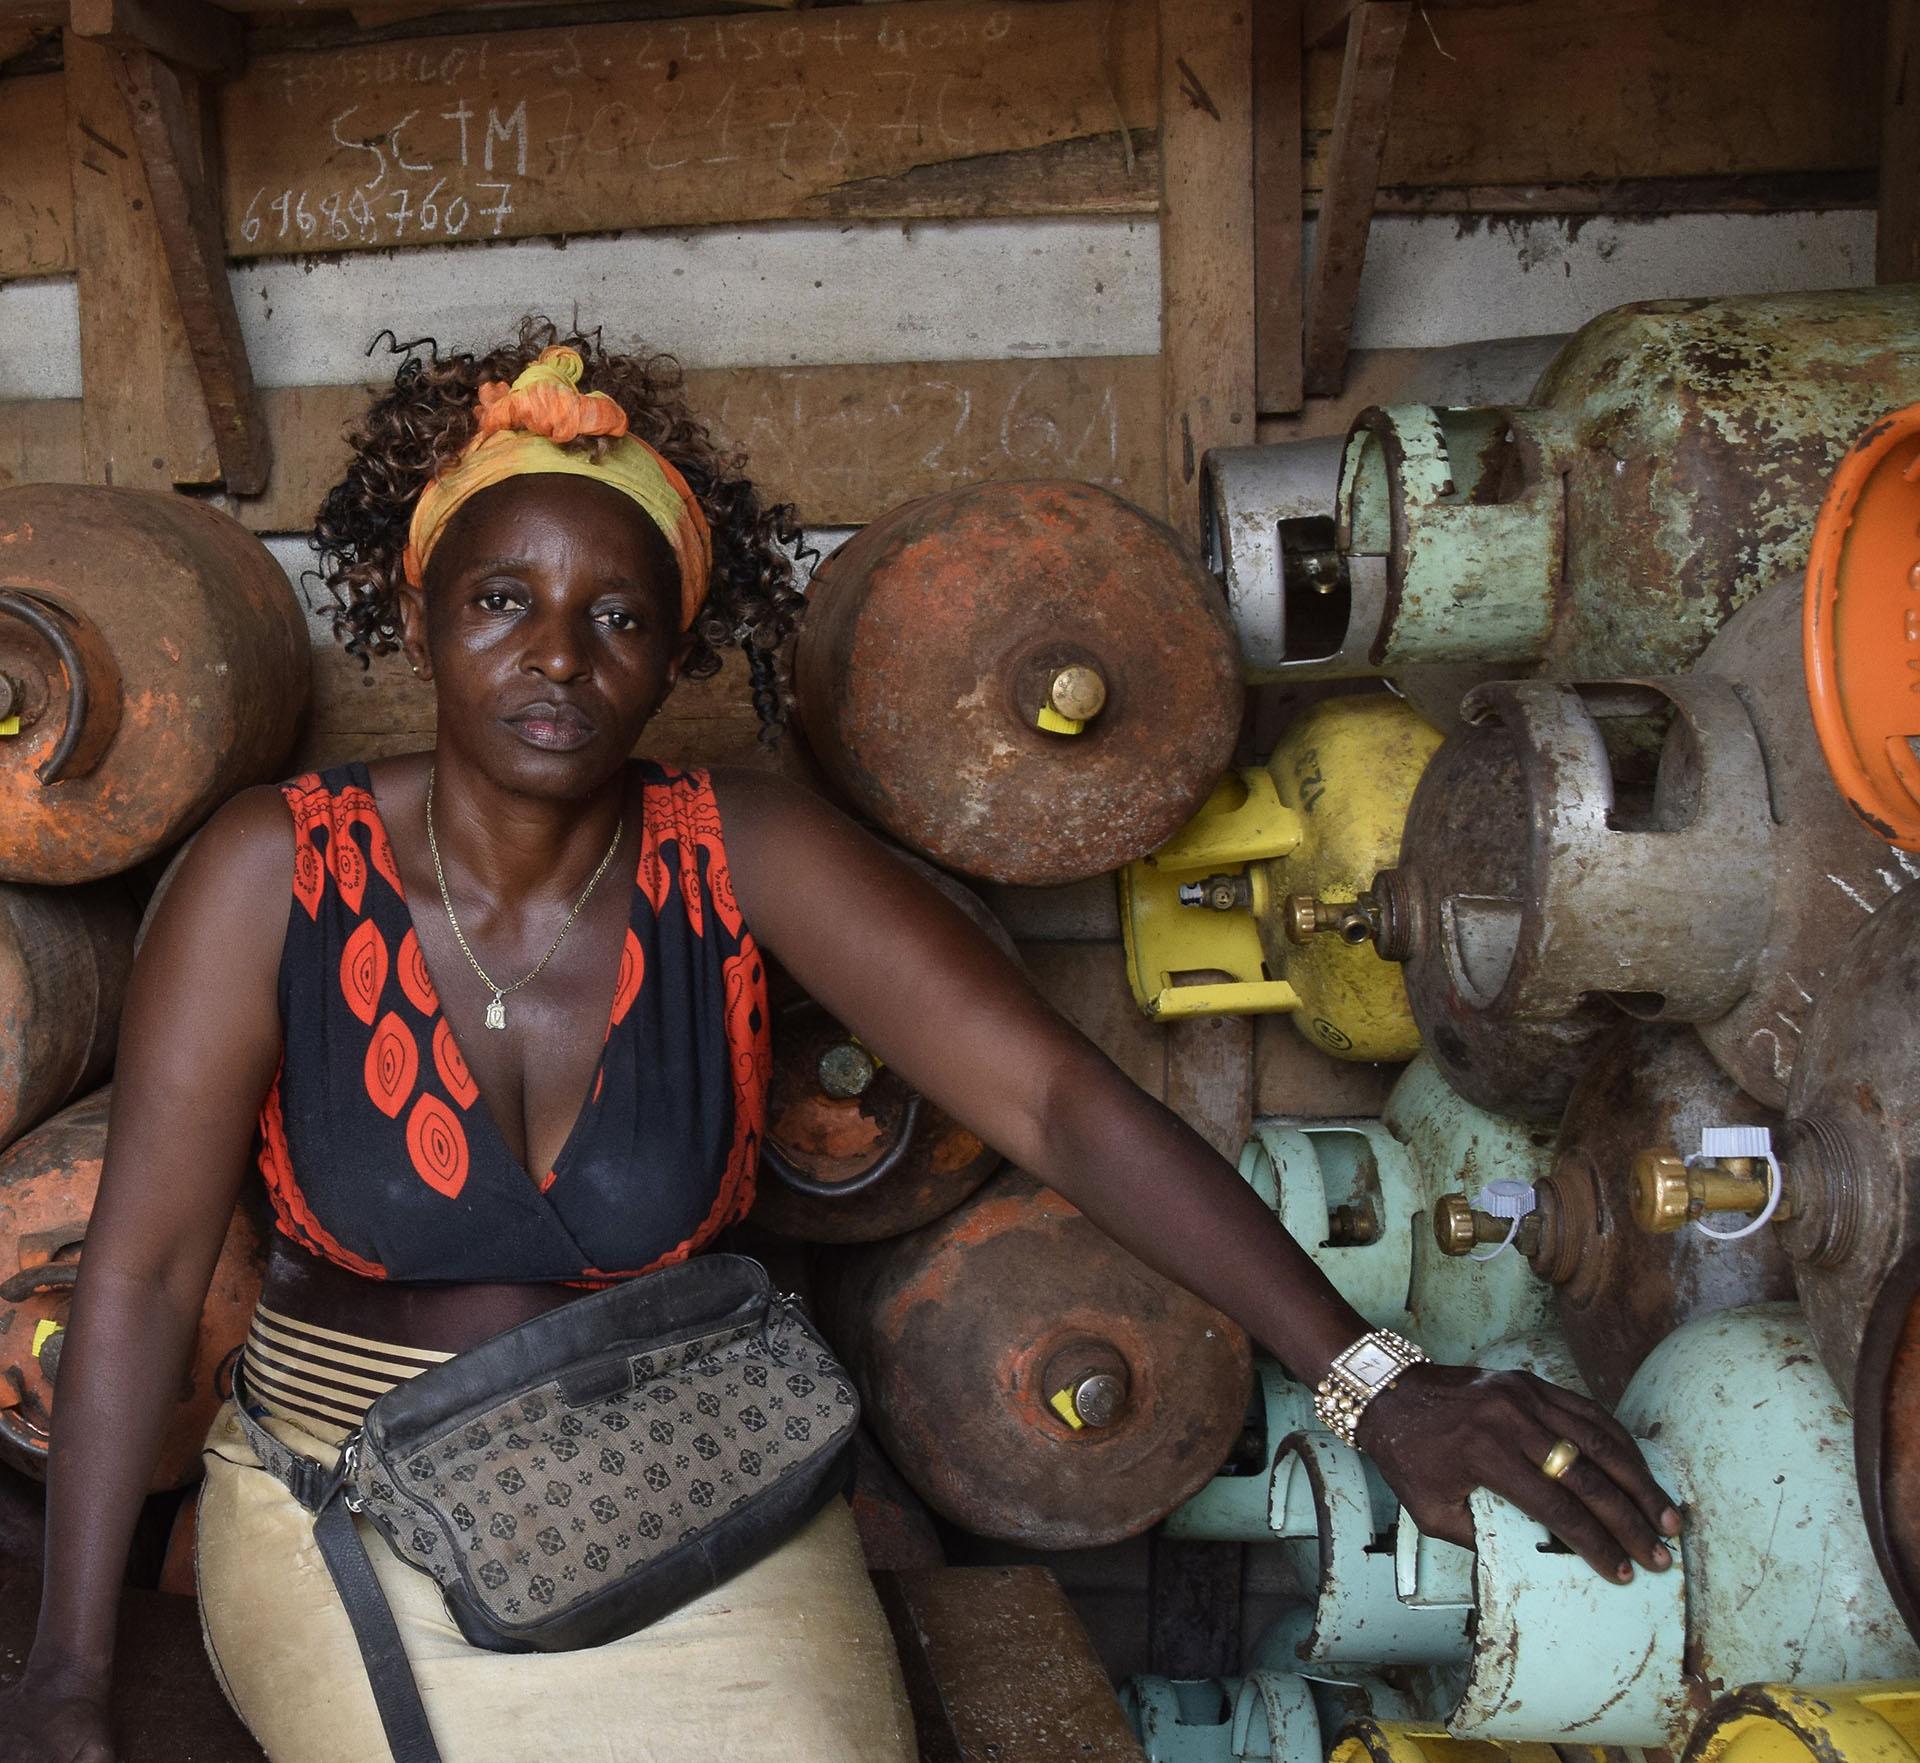 A LPG retail point in peri-urban Douala, Cameroon